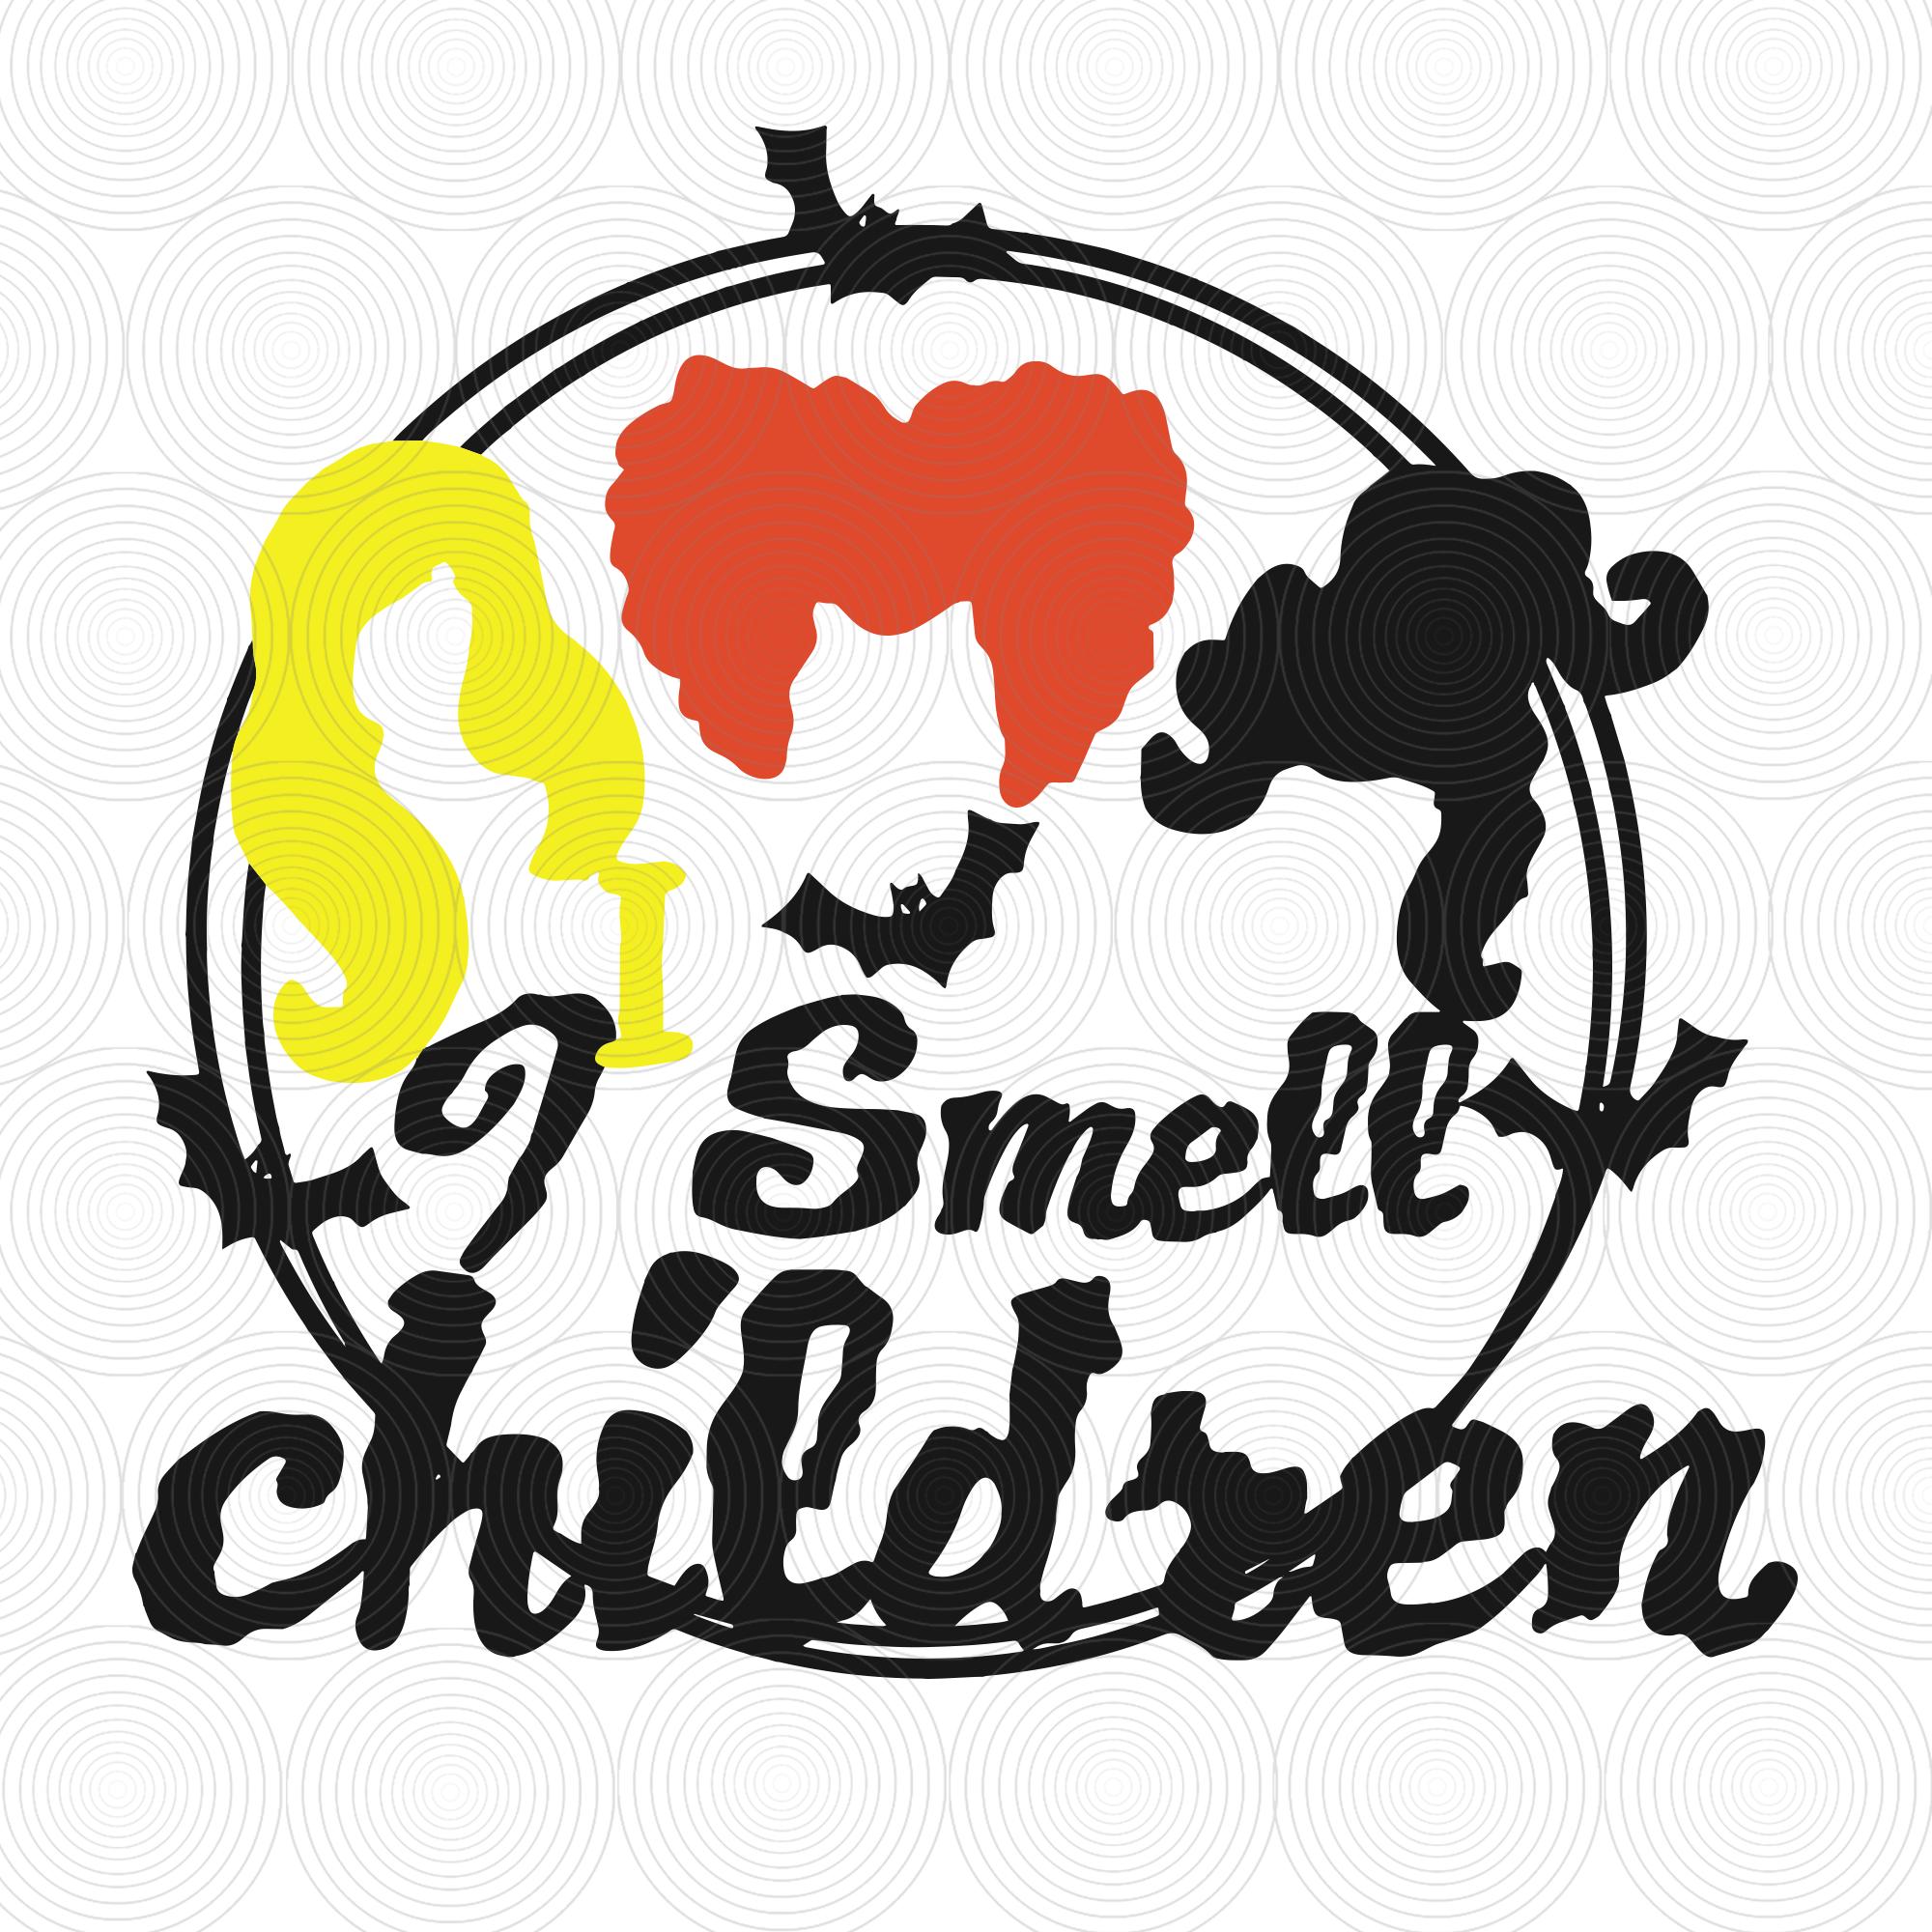 Eacher Halloween Svg I Smell Children Teacher By Digital4u On Zibbet